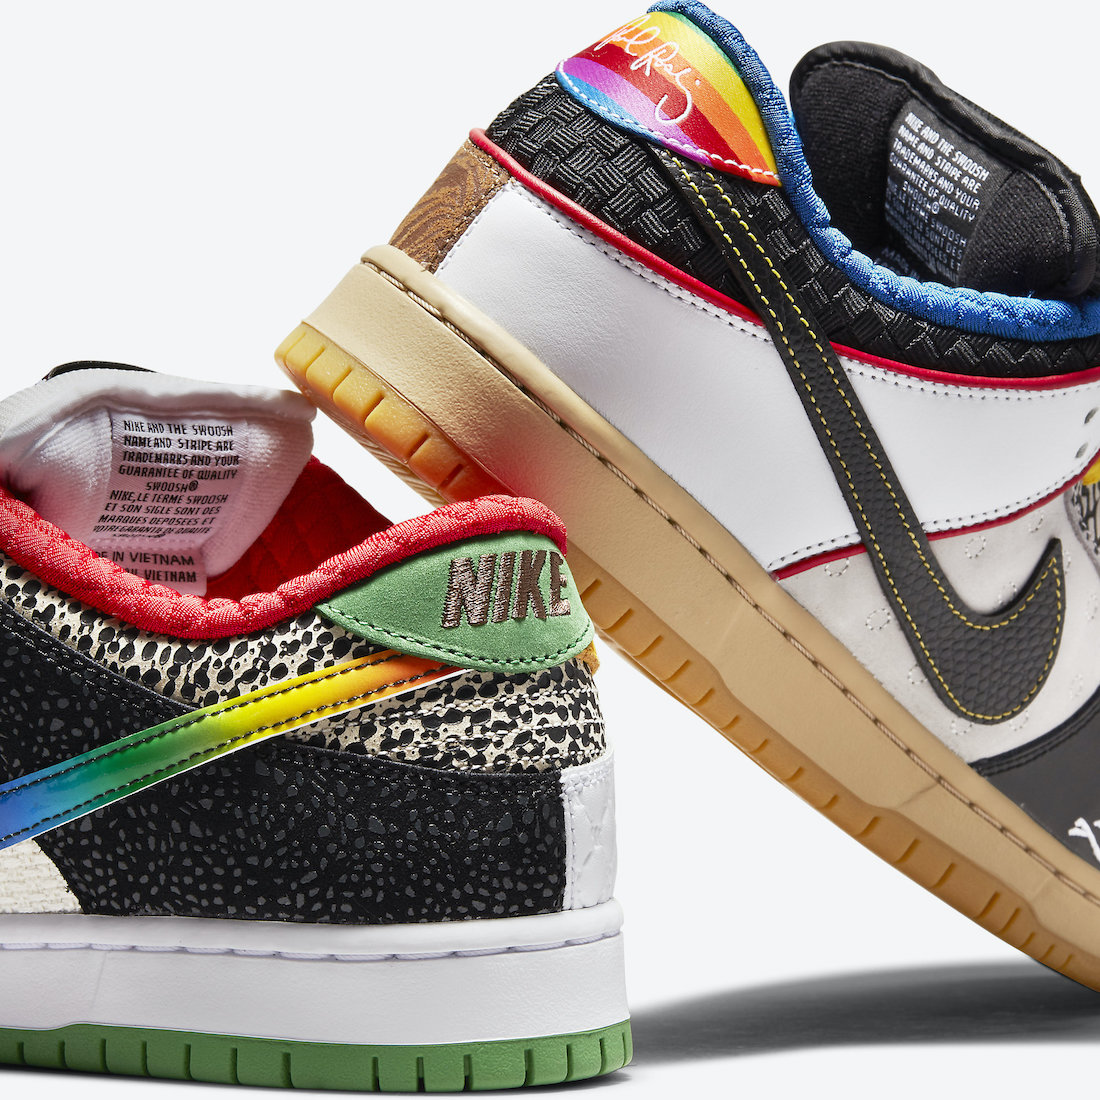 Dunk SB,Nike,发售  今早新 What The Dunk 你中了吗?一张图看懂所有细节!